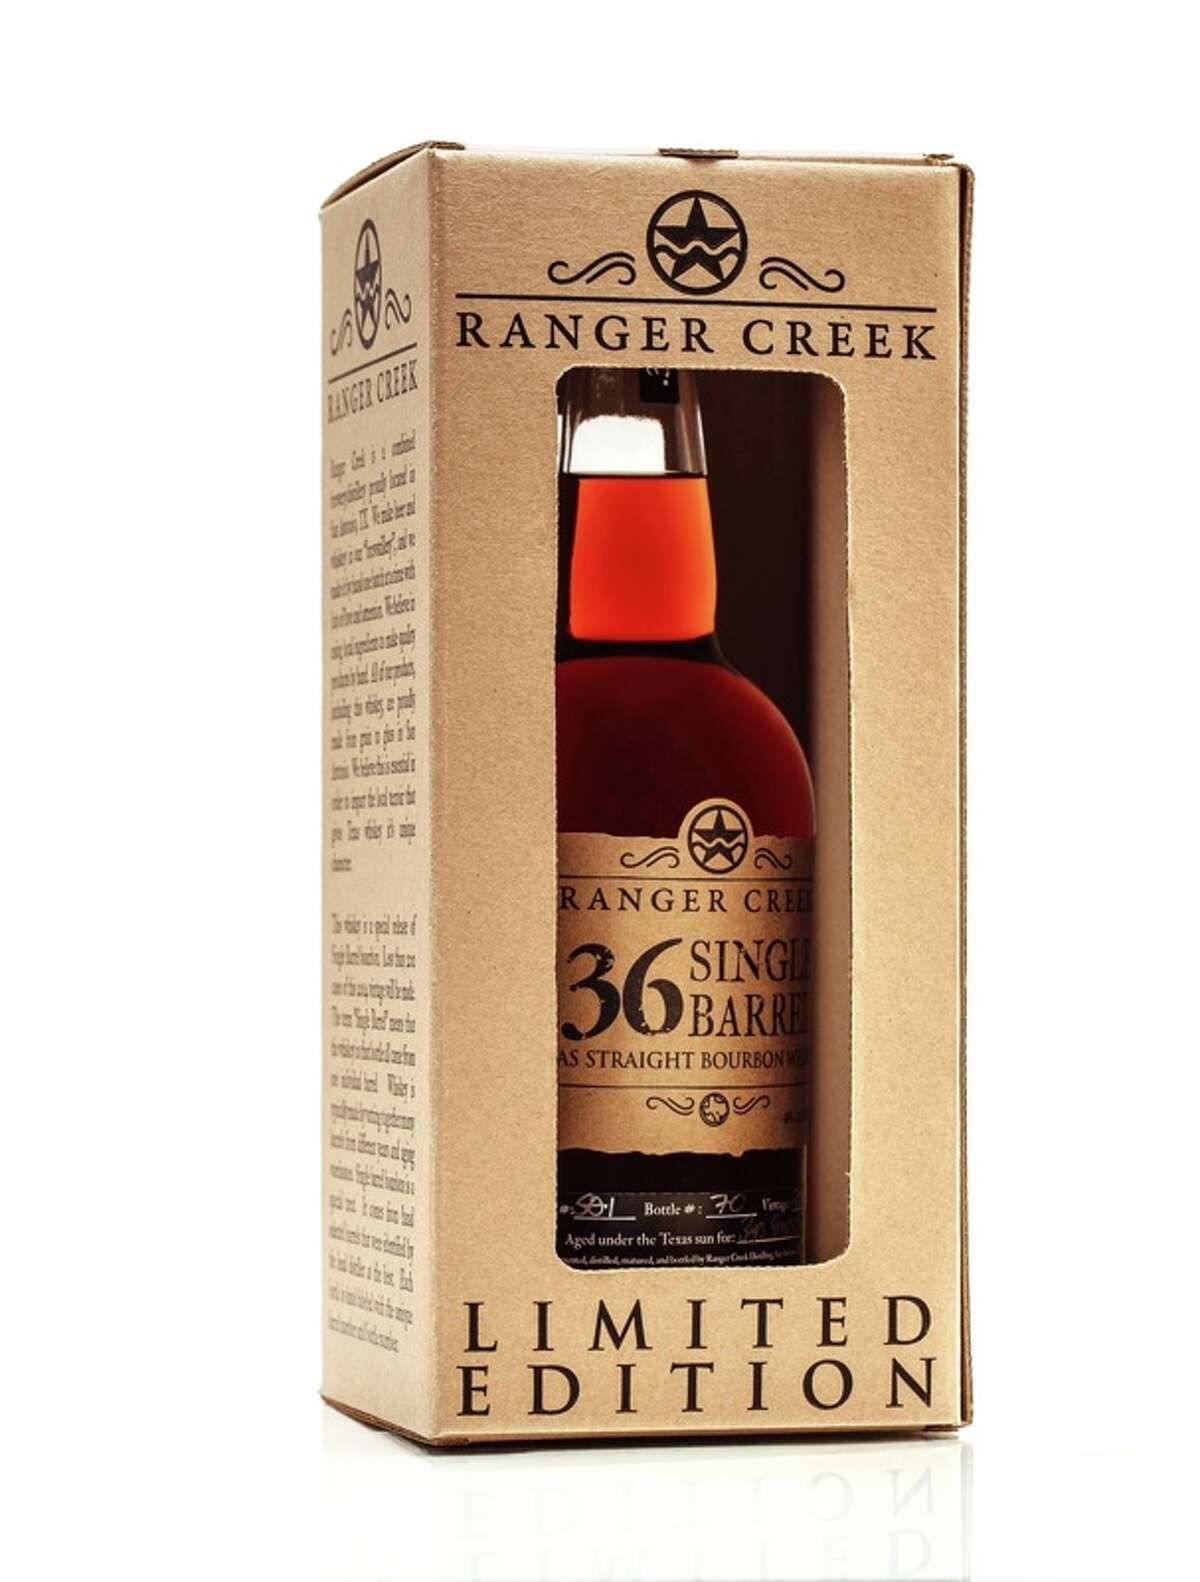 5-year-old Ranger Creek .36 Single Barrel Texas Bourbon